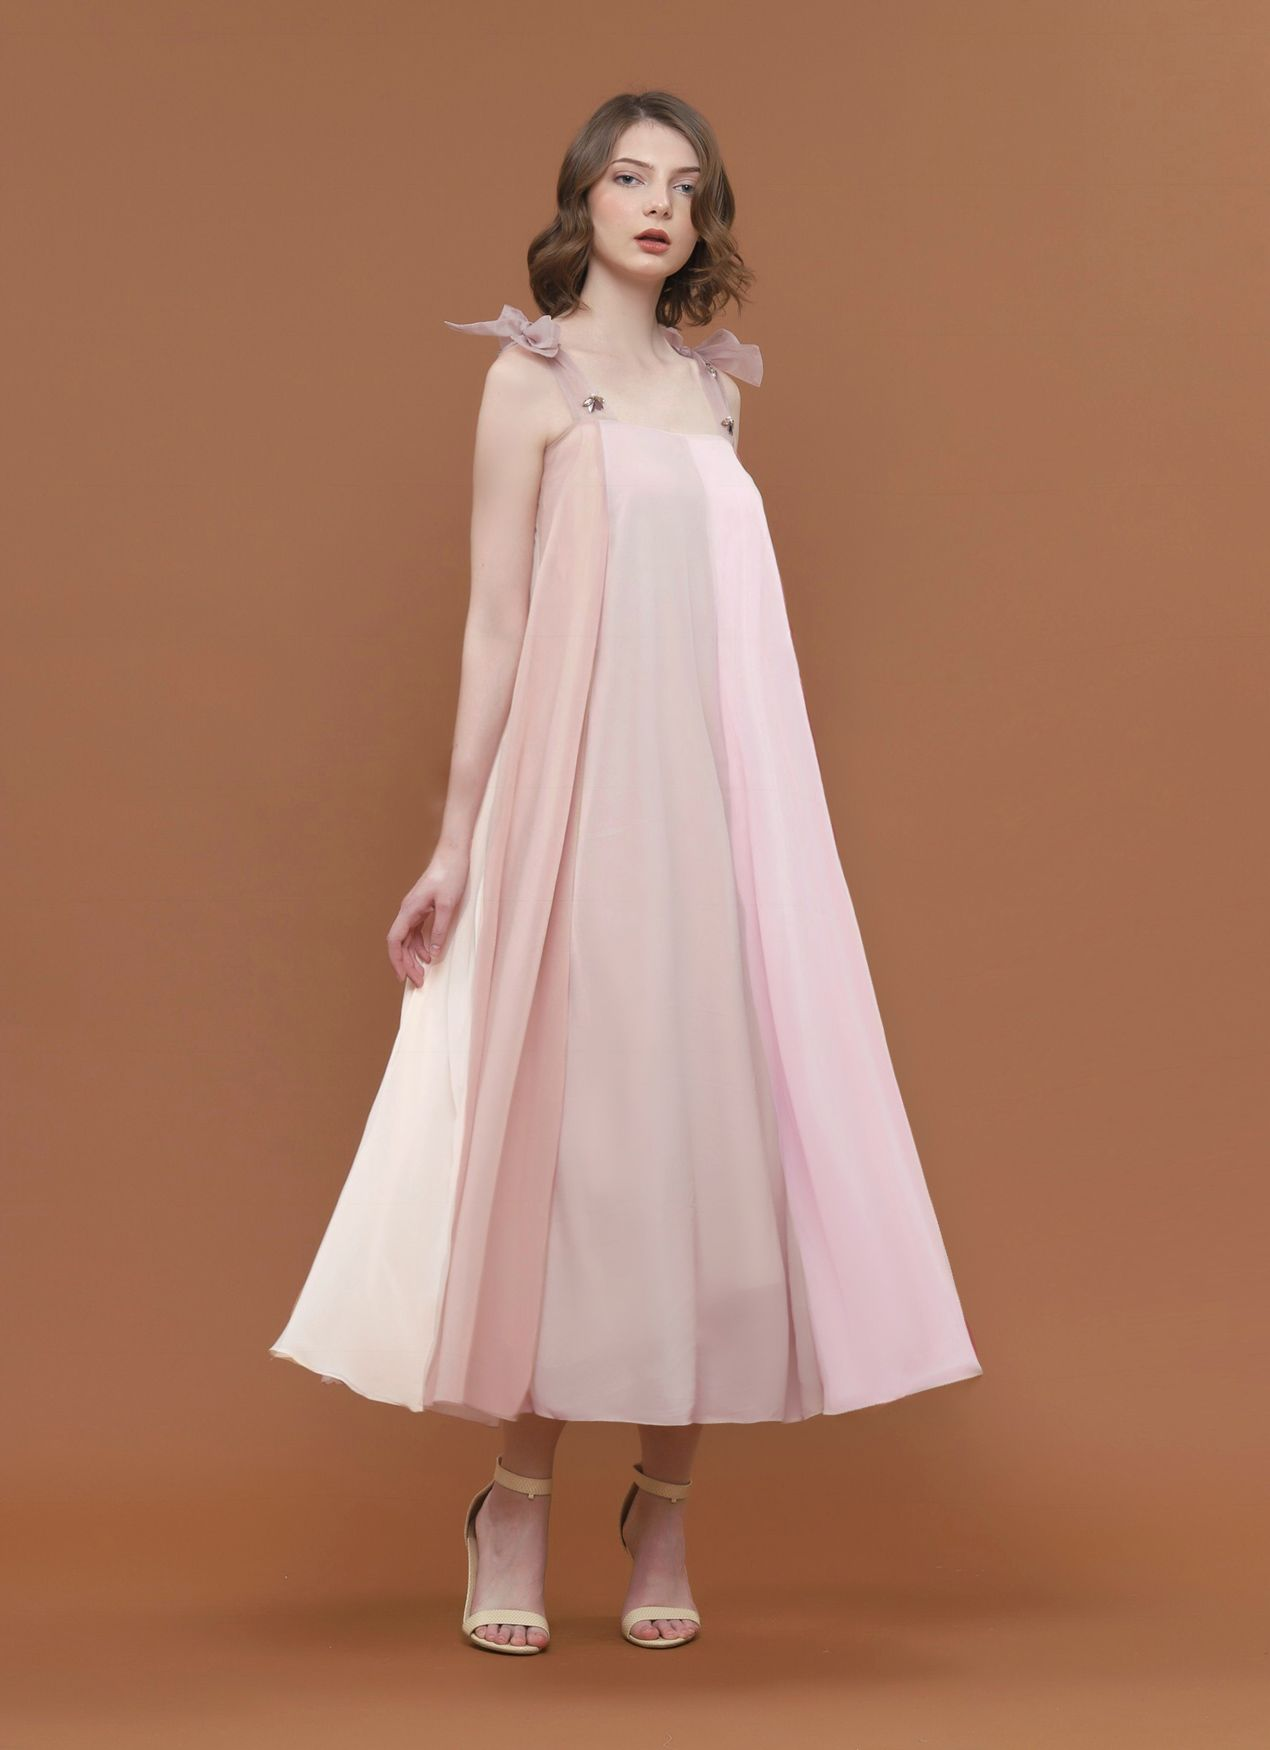 #PopbelaOOTD: Pilihan Dress untuk Datang ke Pernikahan Outdoor